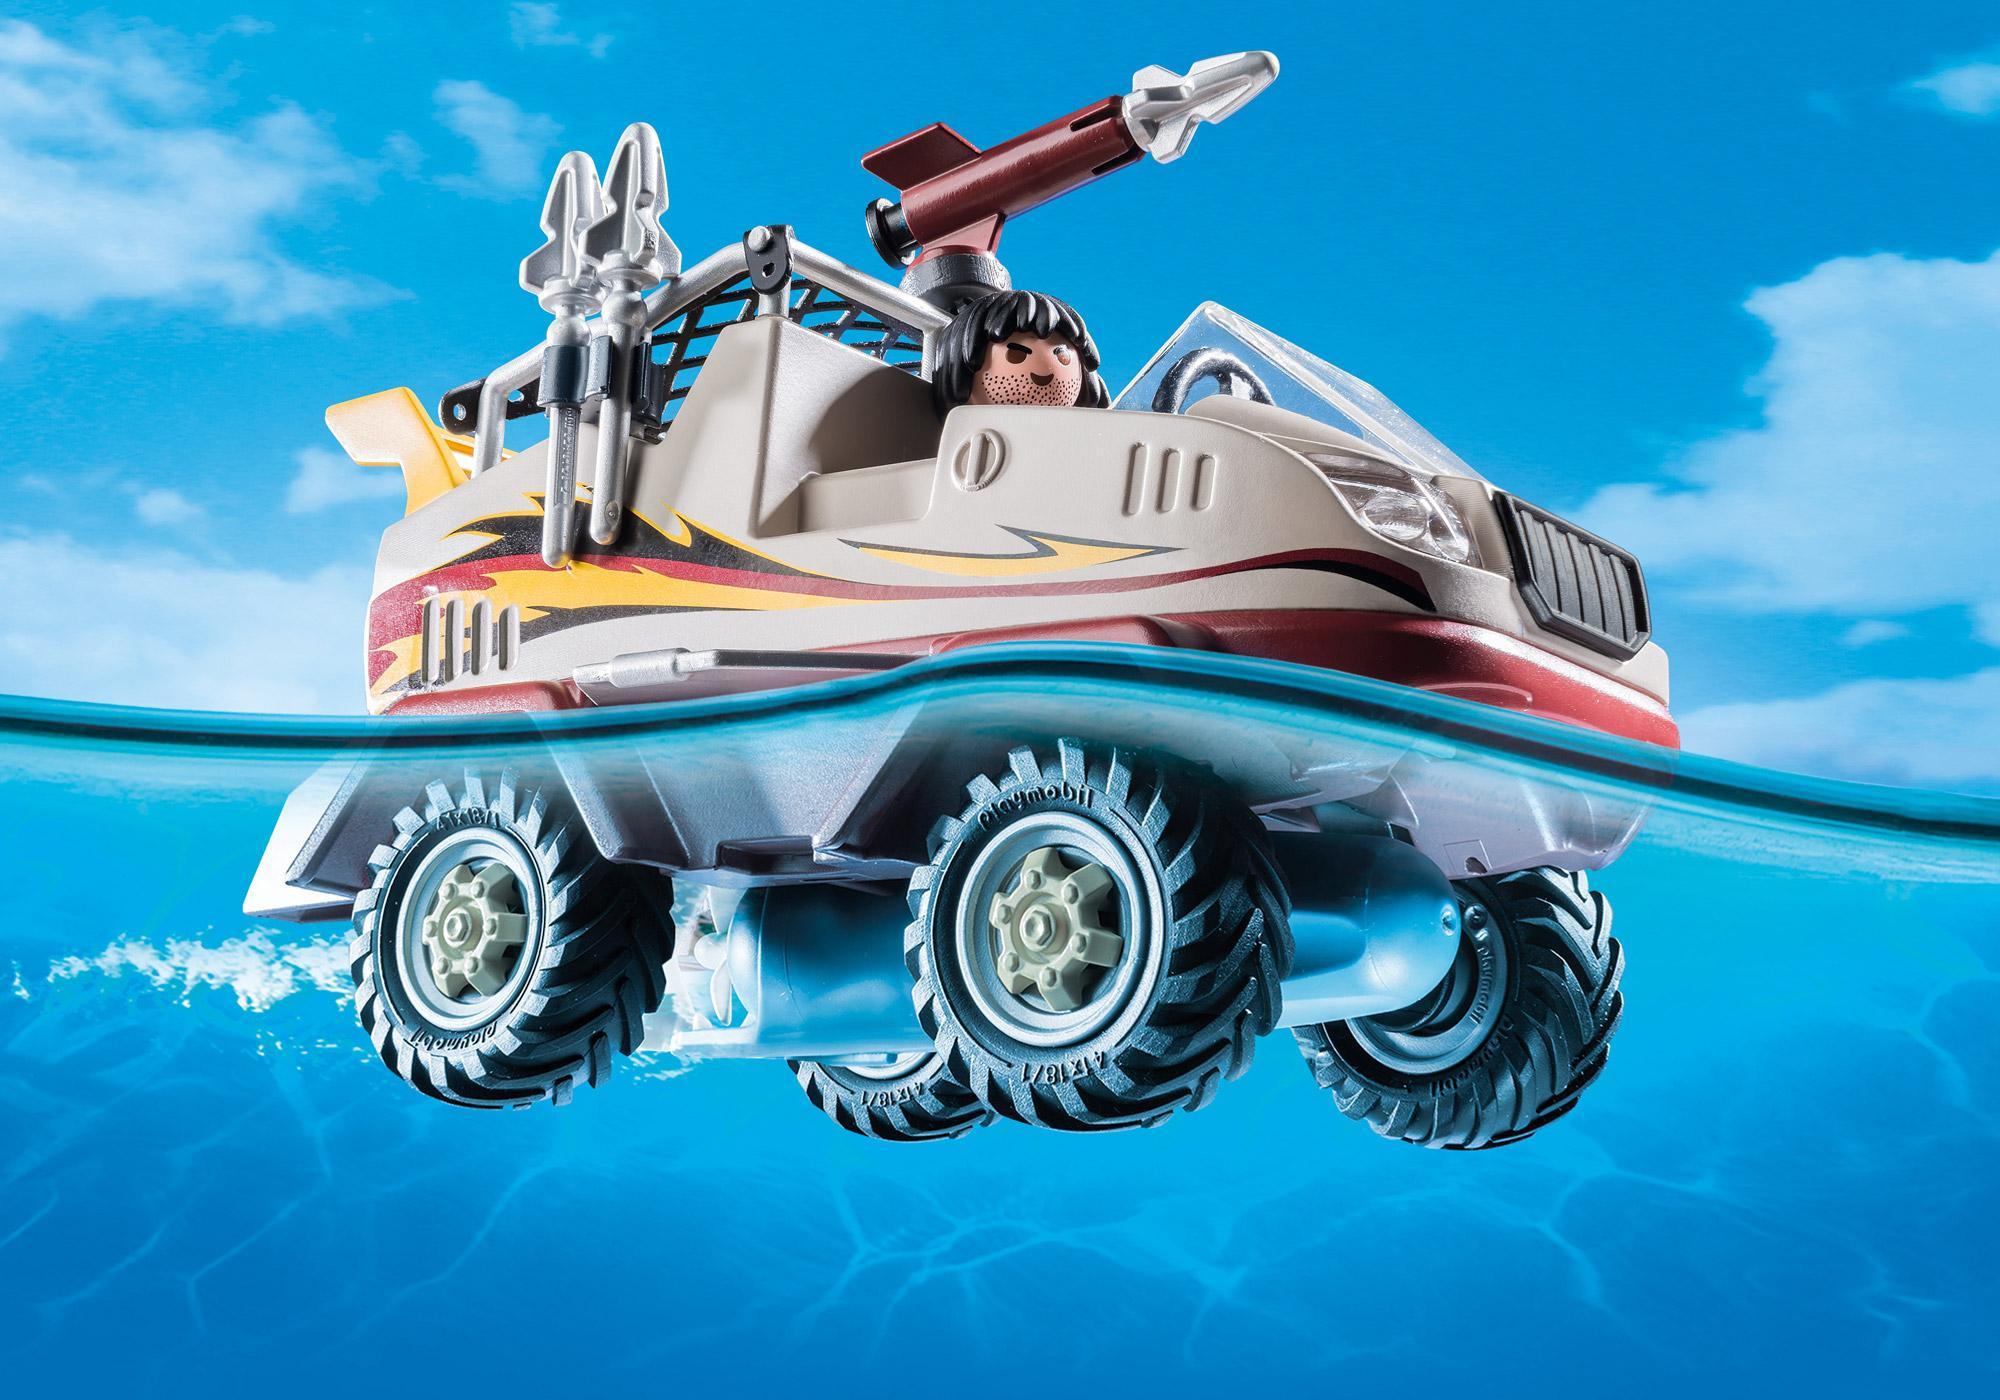 http://media.playmobil.com/i/playmobil/9364_product_extra2/Αμφίβιο όχημα Ομάδας Ειδικών Αποστολών